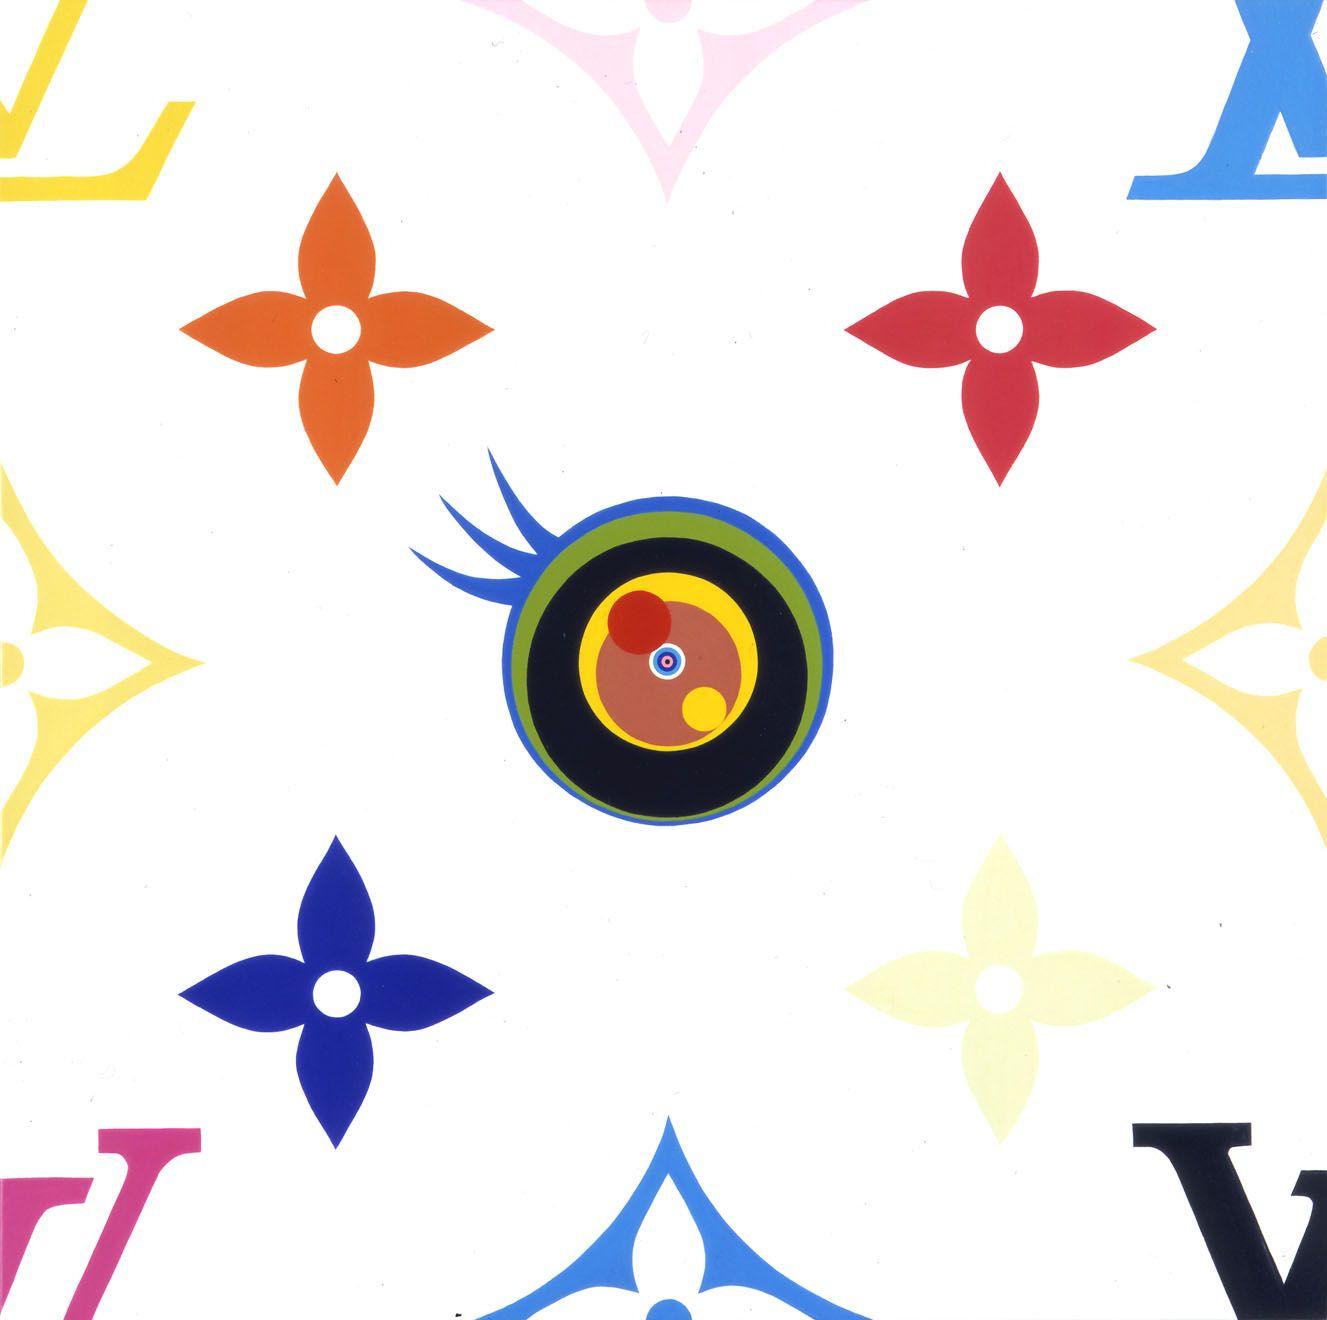 Eye Love SUPERFLAT, 2003, Acrylic on canvas mounted on wood